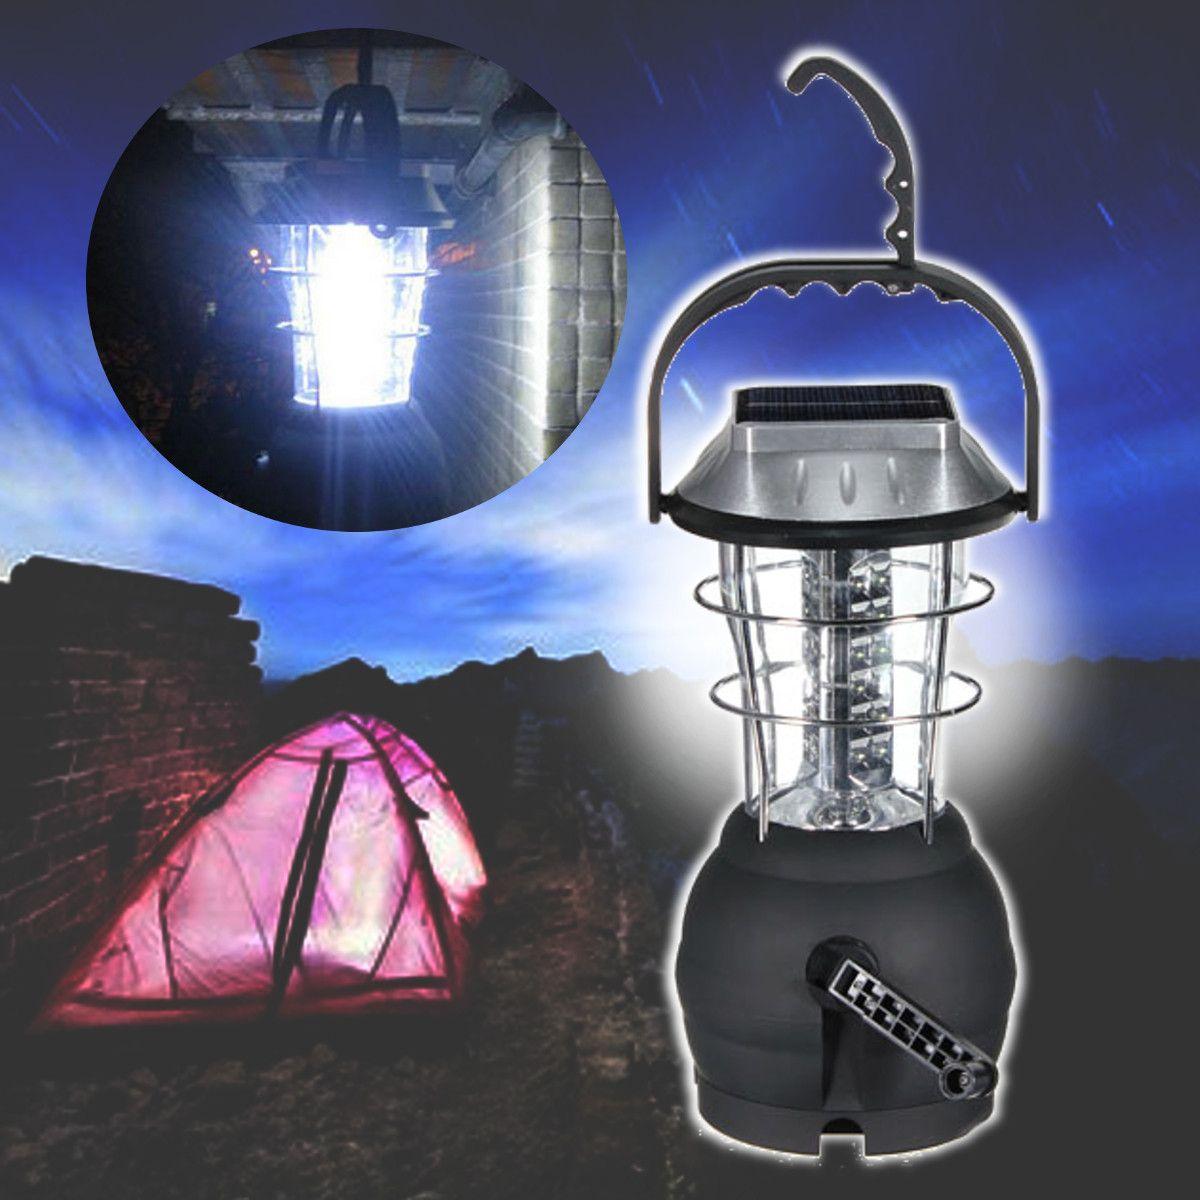 Outdoor 36 leds solar light lantern rechargeable tent lamp hand outdoor 36 leds solar light lantern rechargeable tent lamp hand crank dynamo for camping hiking aloadofball Gallery